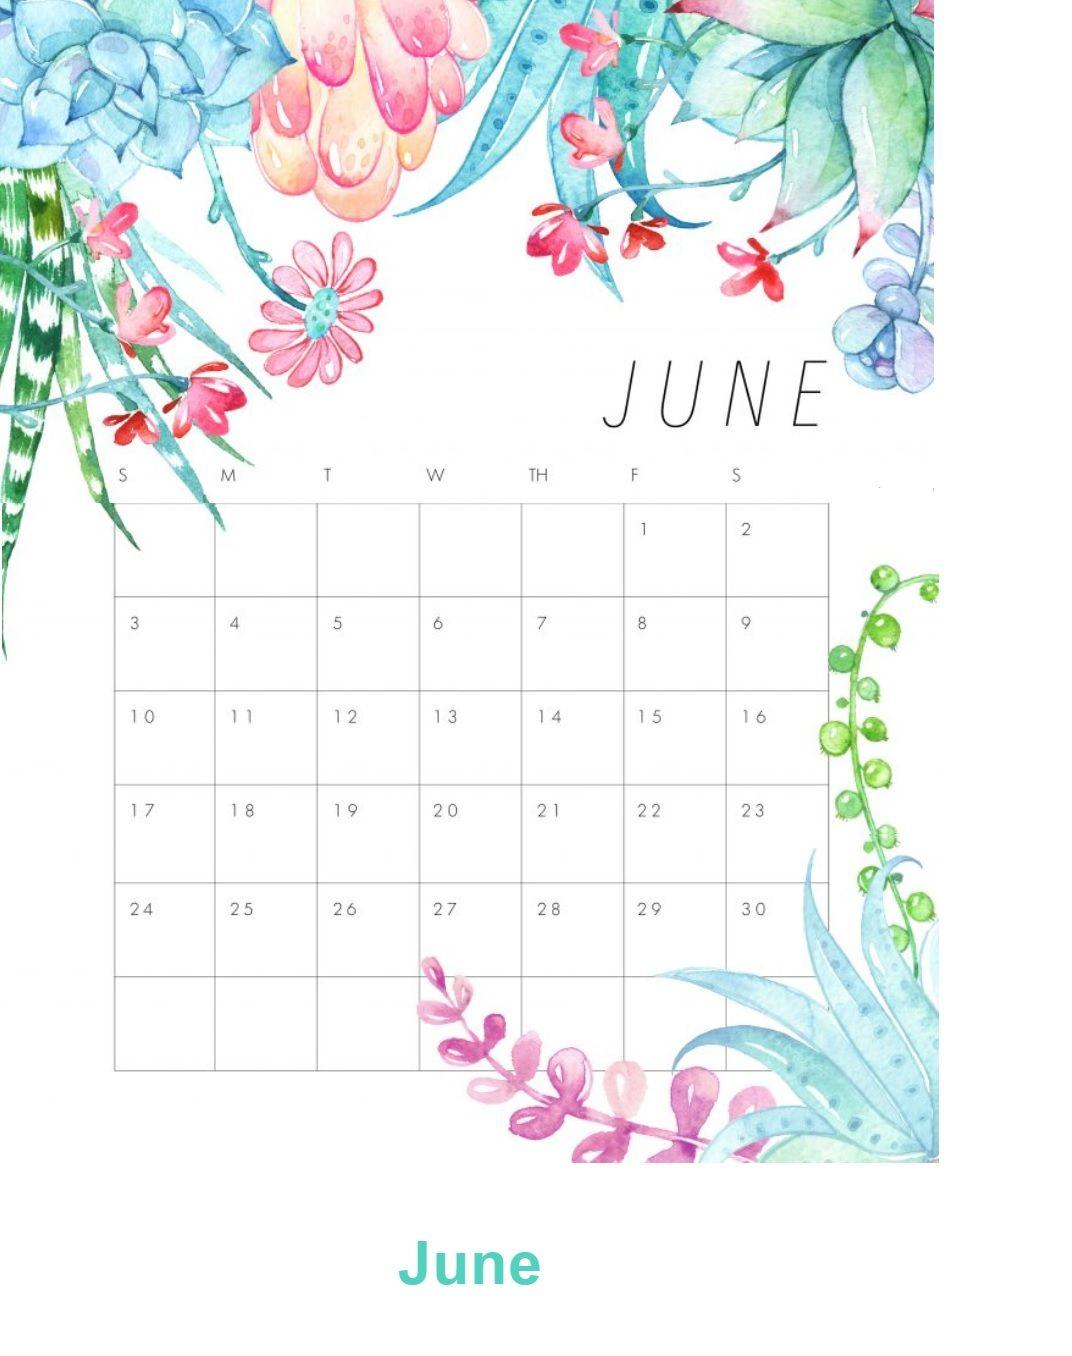 June 2018 Floral Calendar